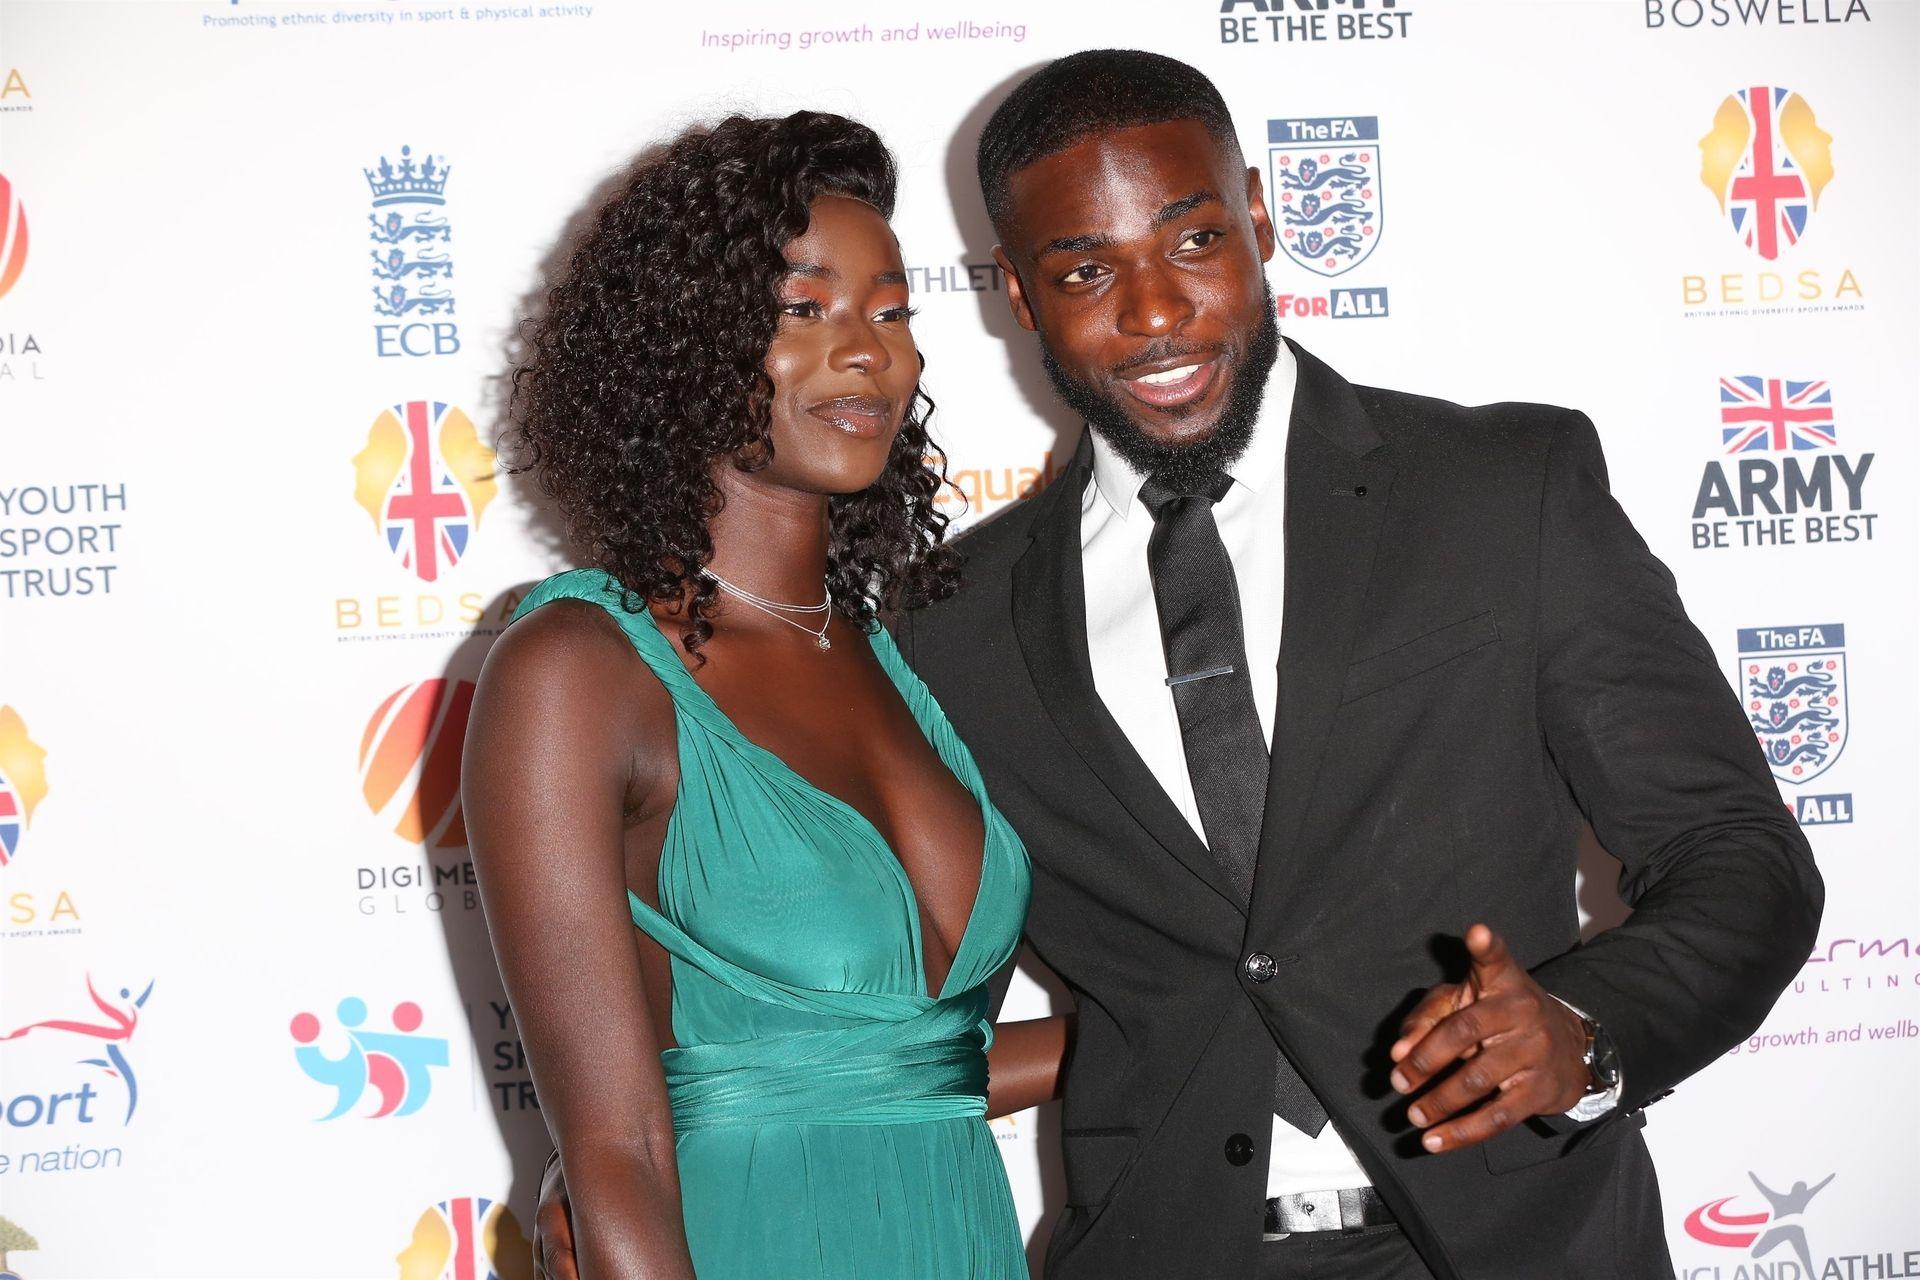 Mike Boateng & Priscilla Anyabu Are Seen At British Ethnic Diversity Sports Awards 0010